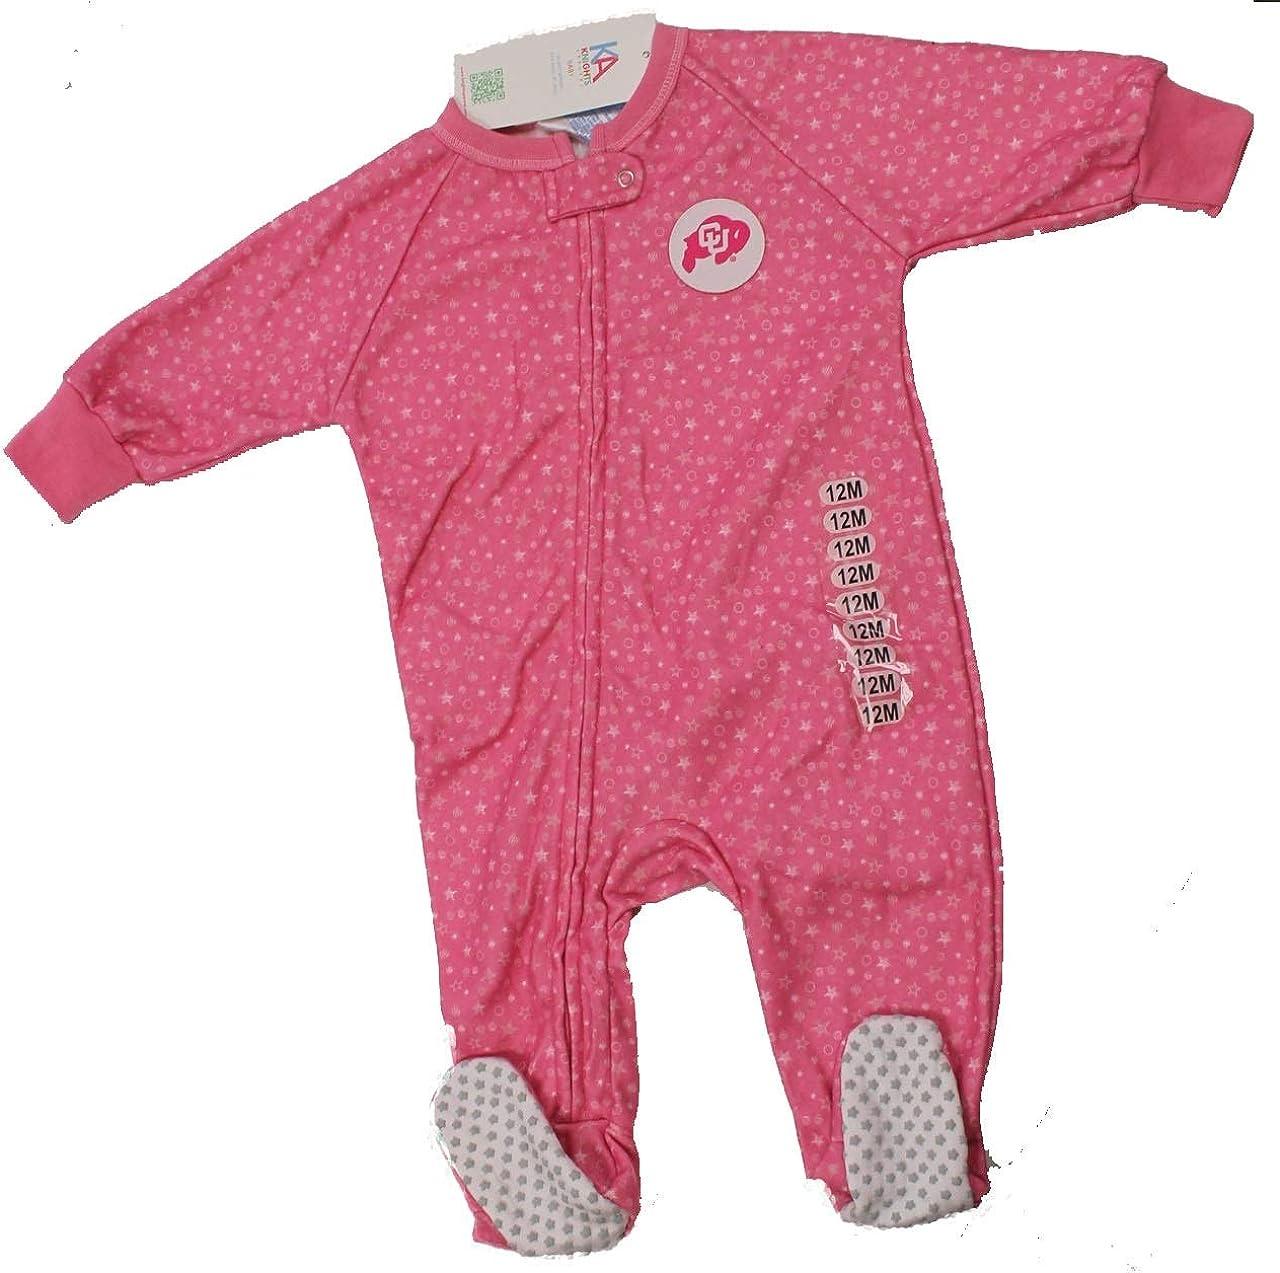 NCAA Colorado University Baby 2-Pack Fleece Footed Sleep and Play